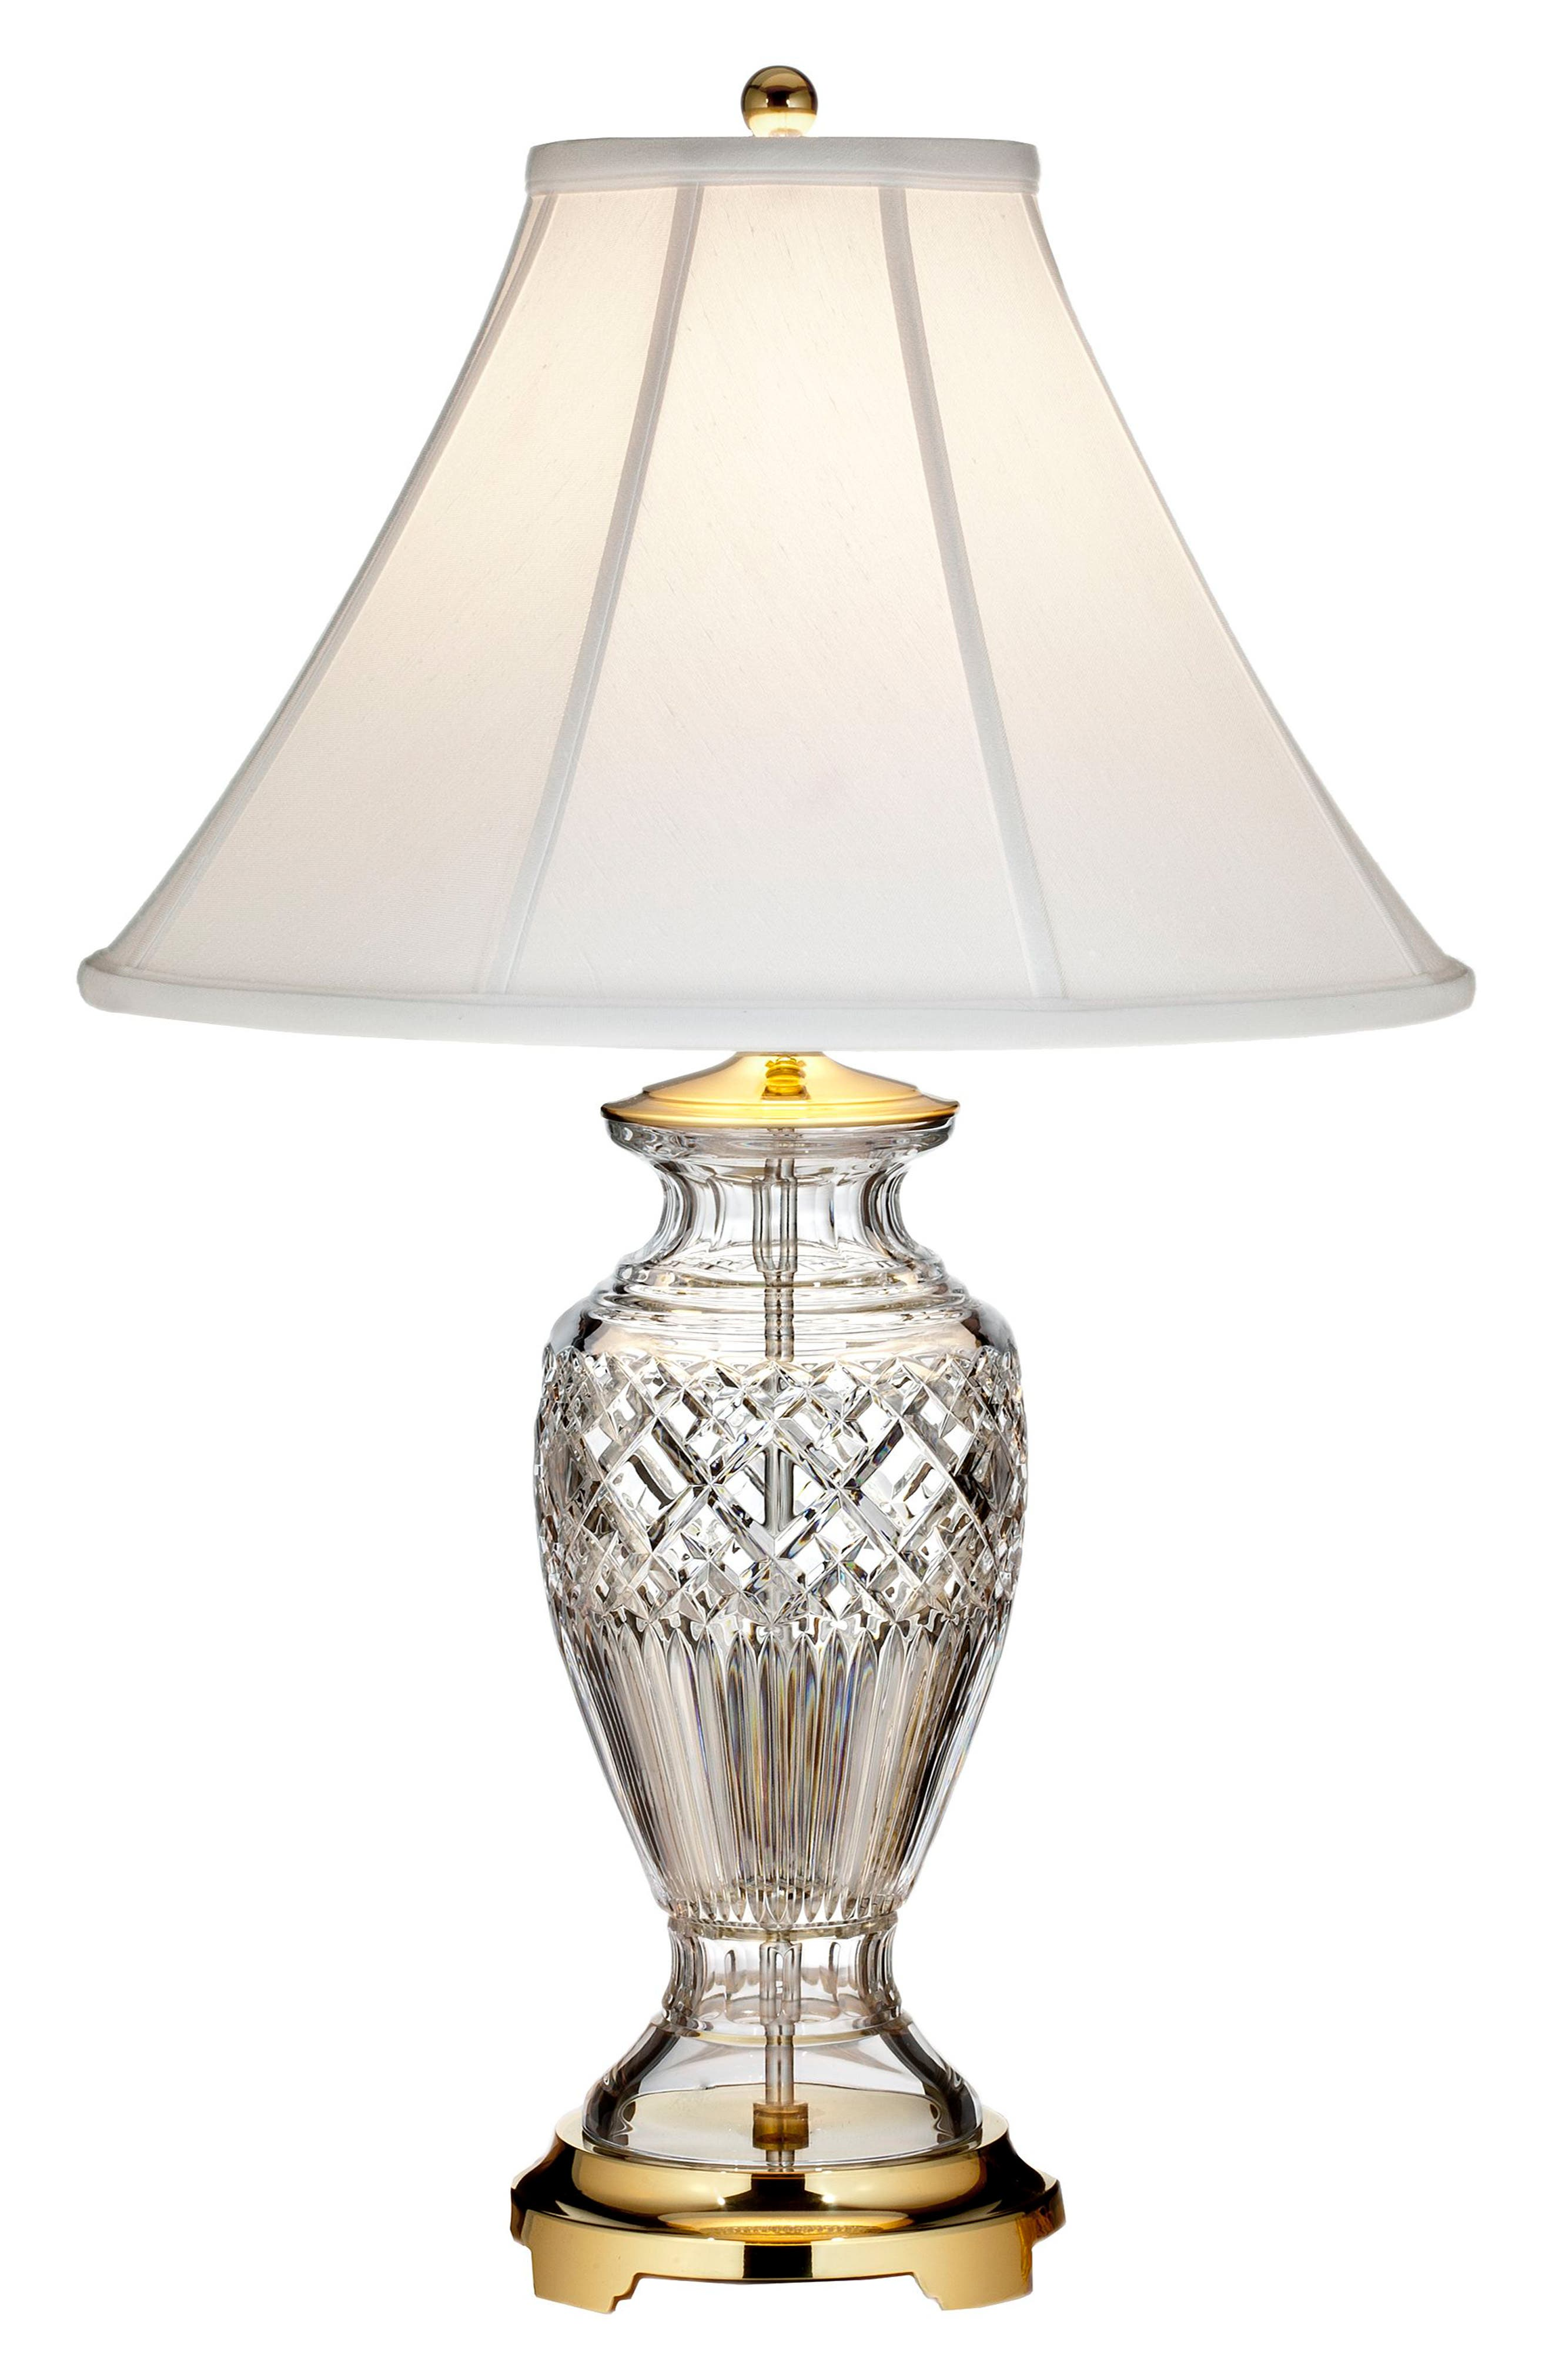 Main Image - Waterford Kilmore Lead Crystal Table Lamp